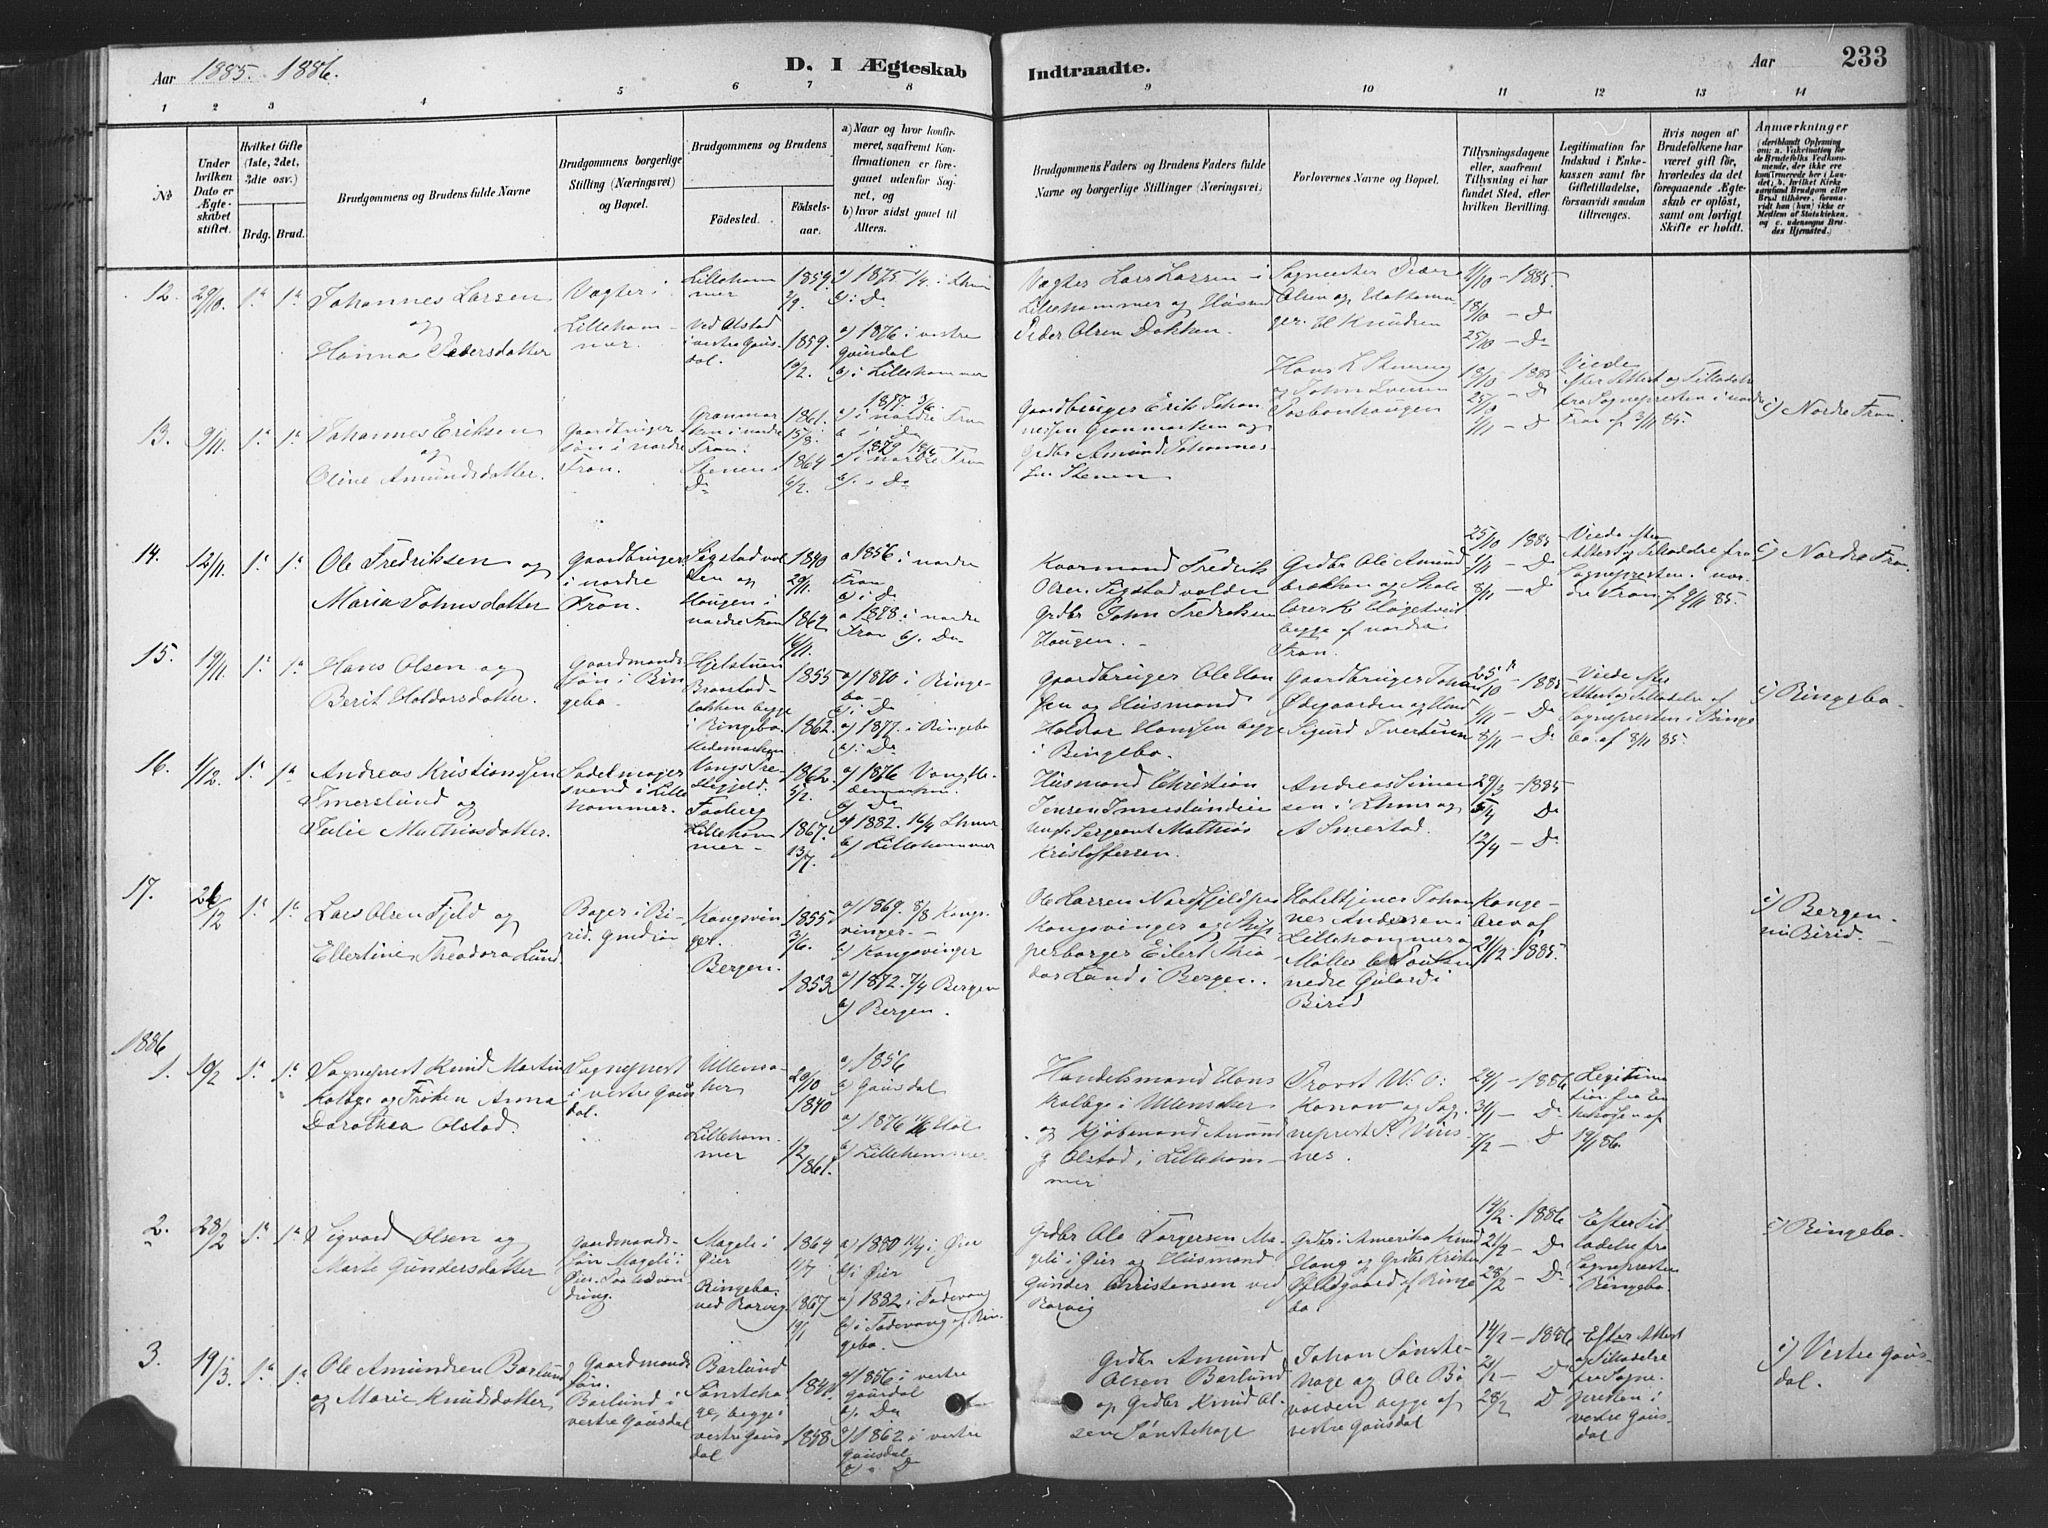 SAH, Fåberg prestekontor, Ministerialbok nr. 10, 1879-1900, s. 233